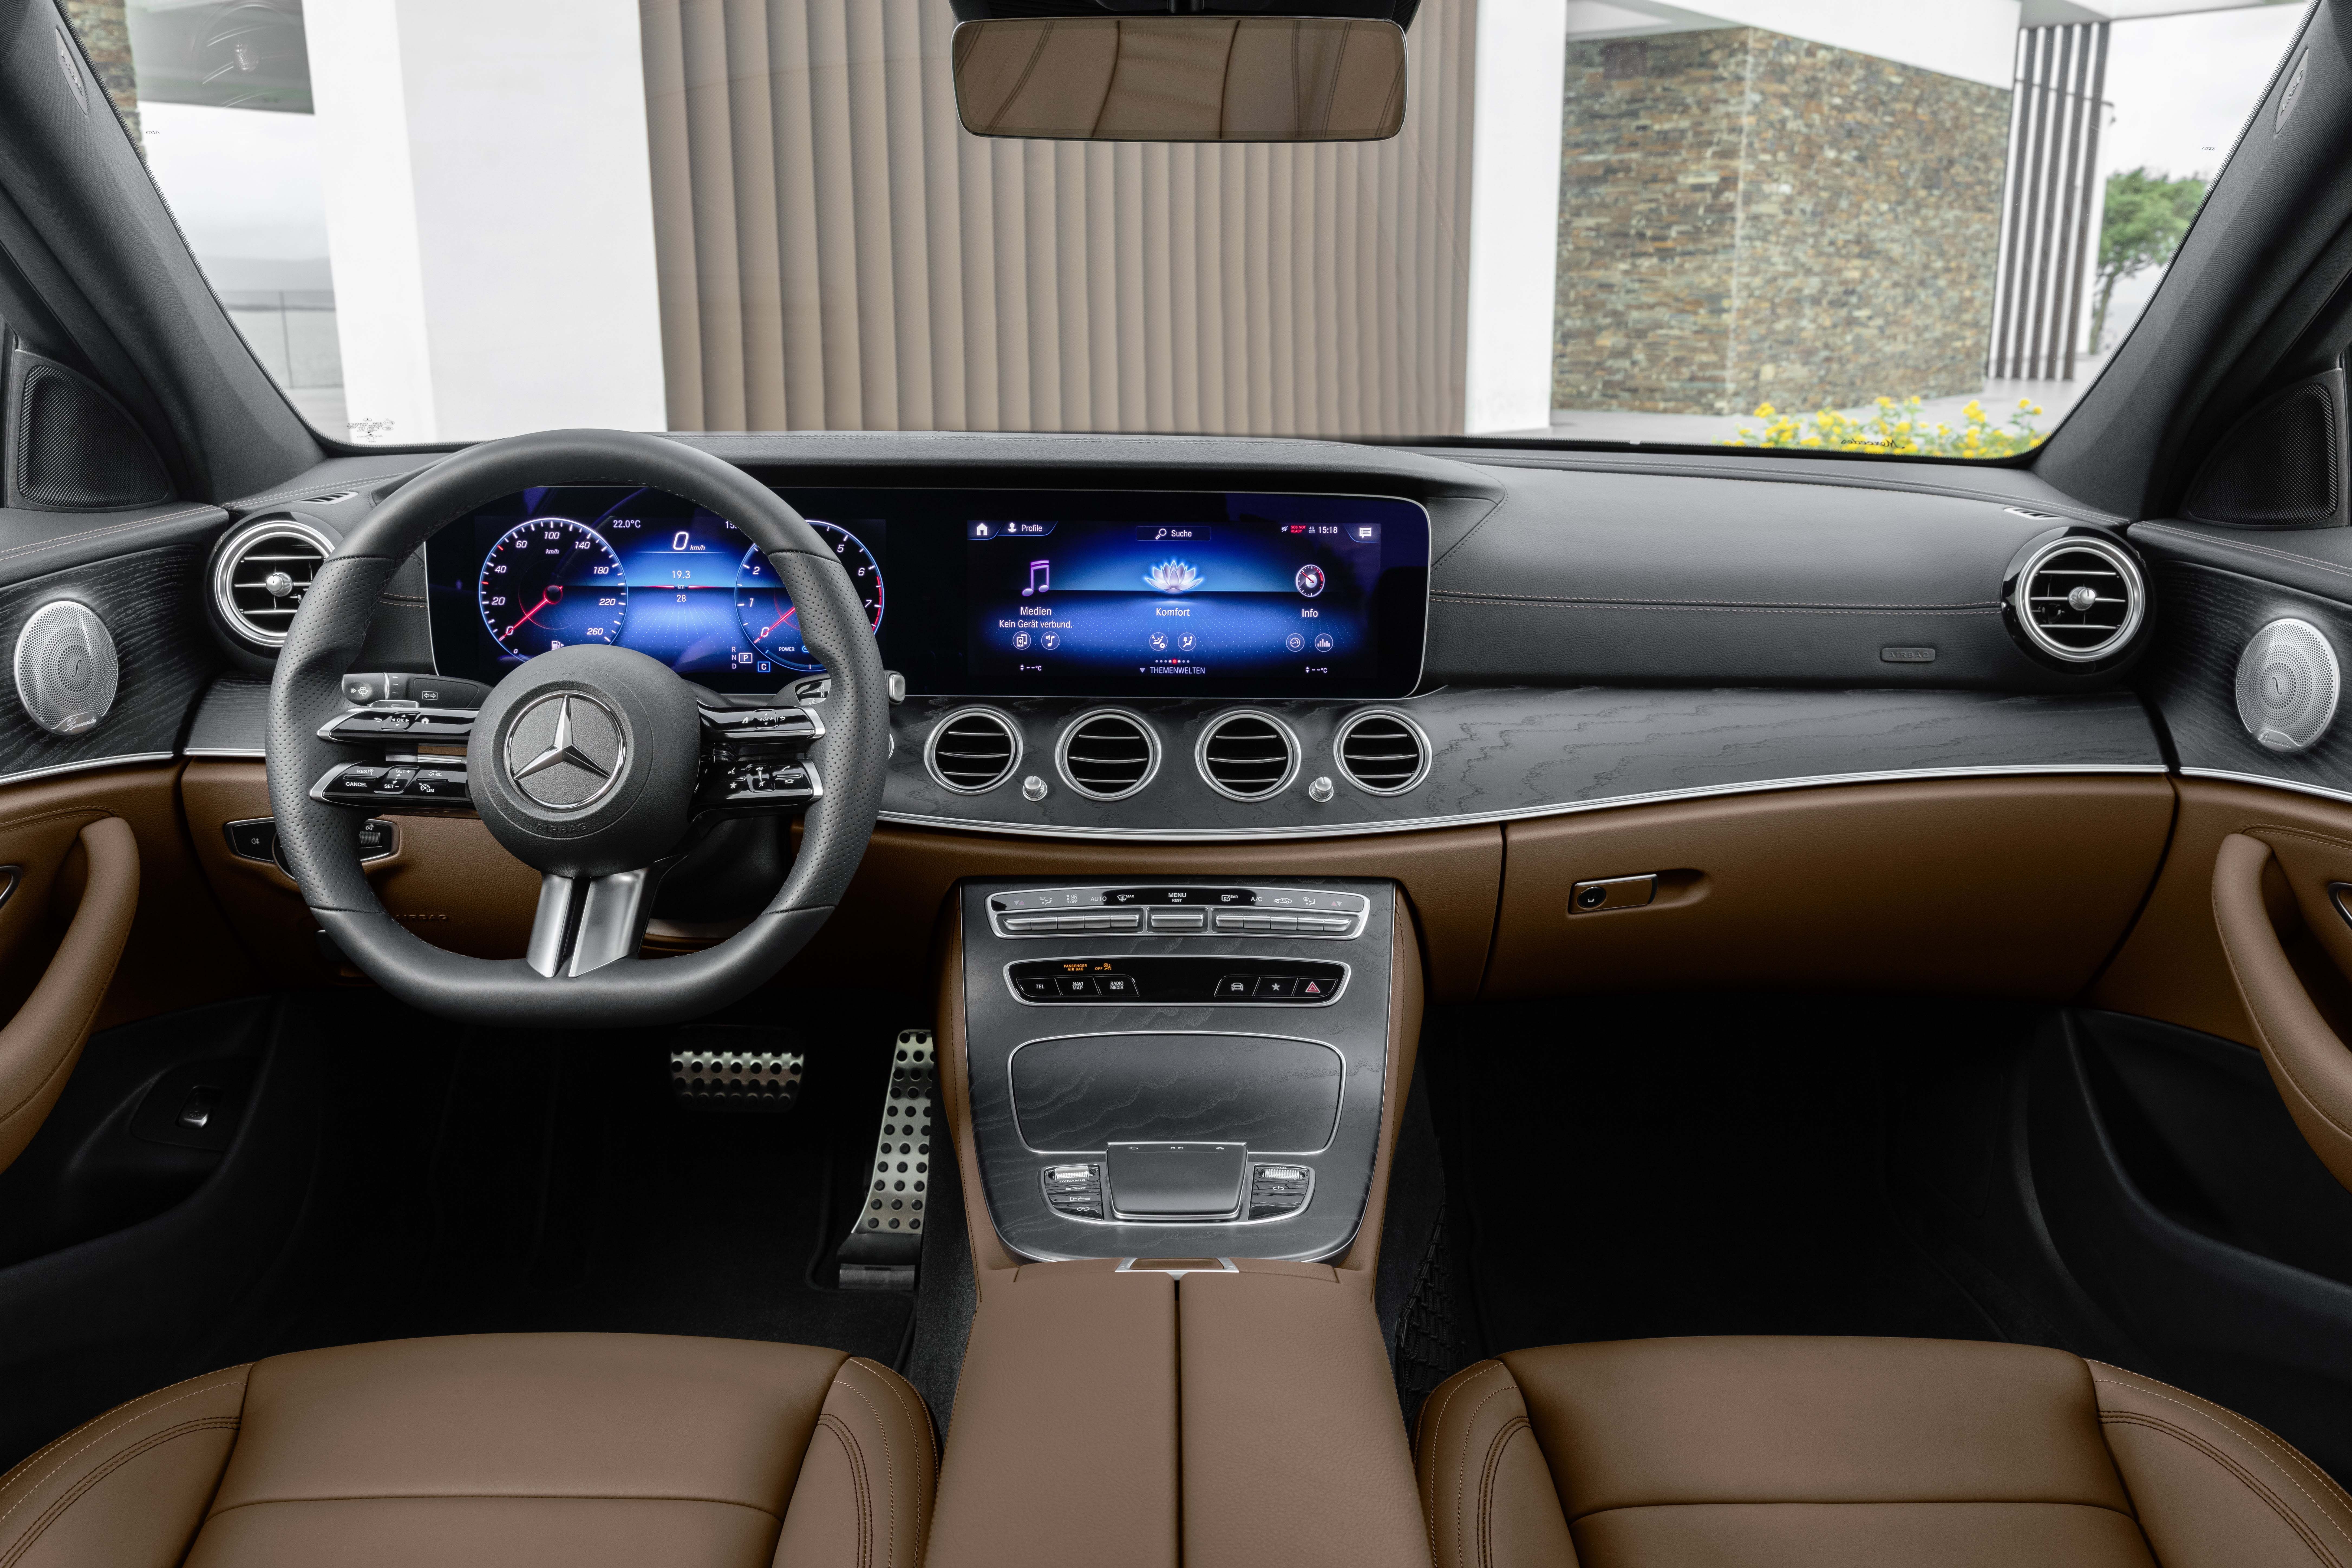 2021 Mercedes Benz E Class Gets Touch Sensitive Steering Wheel